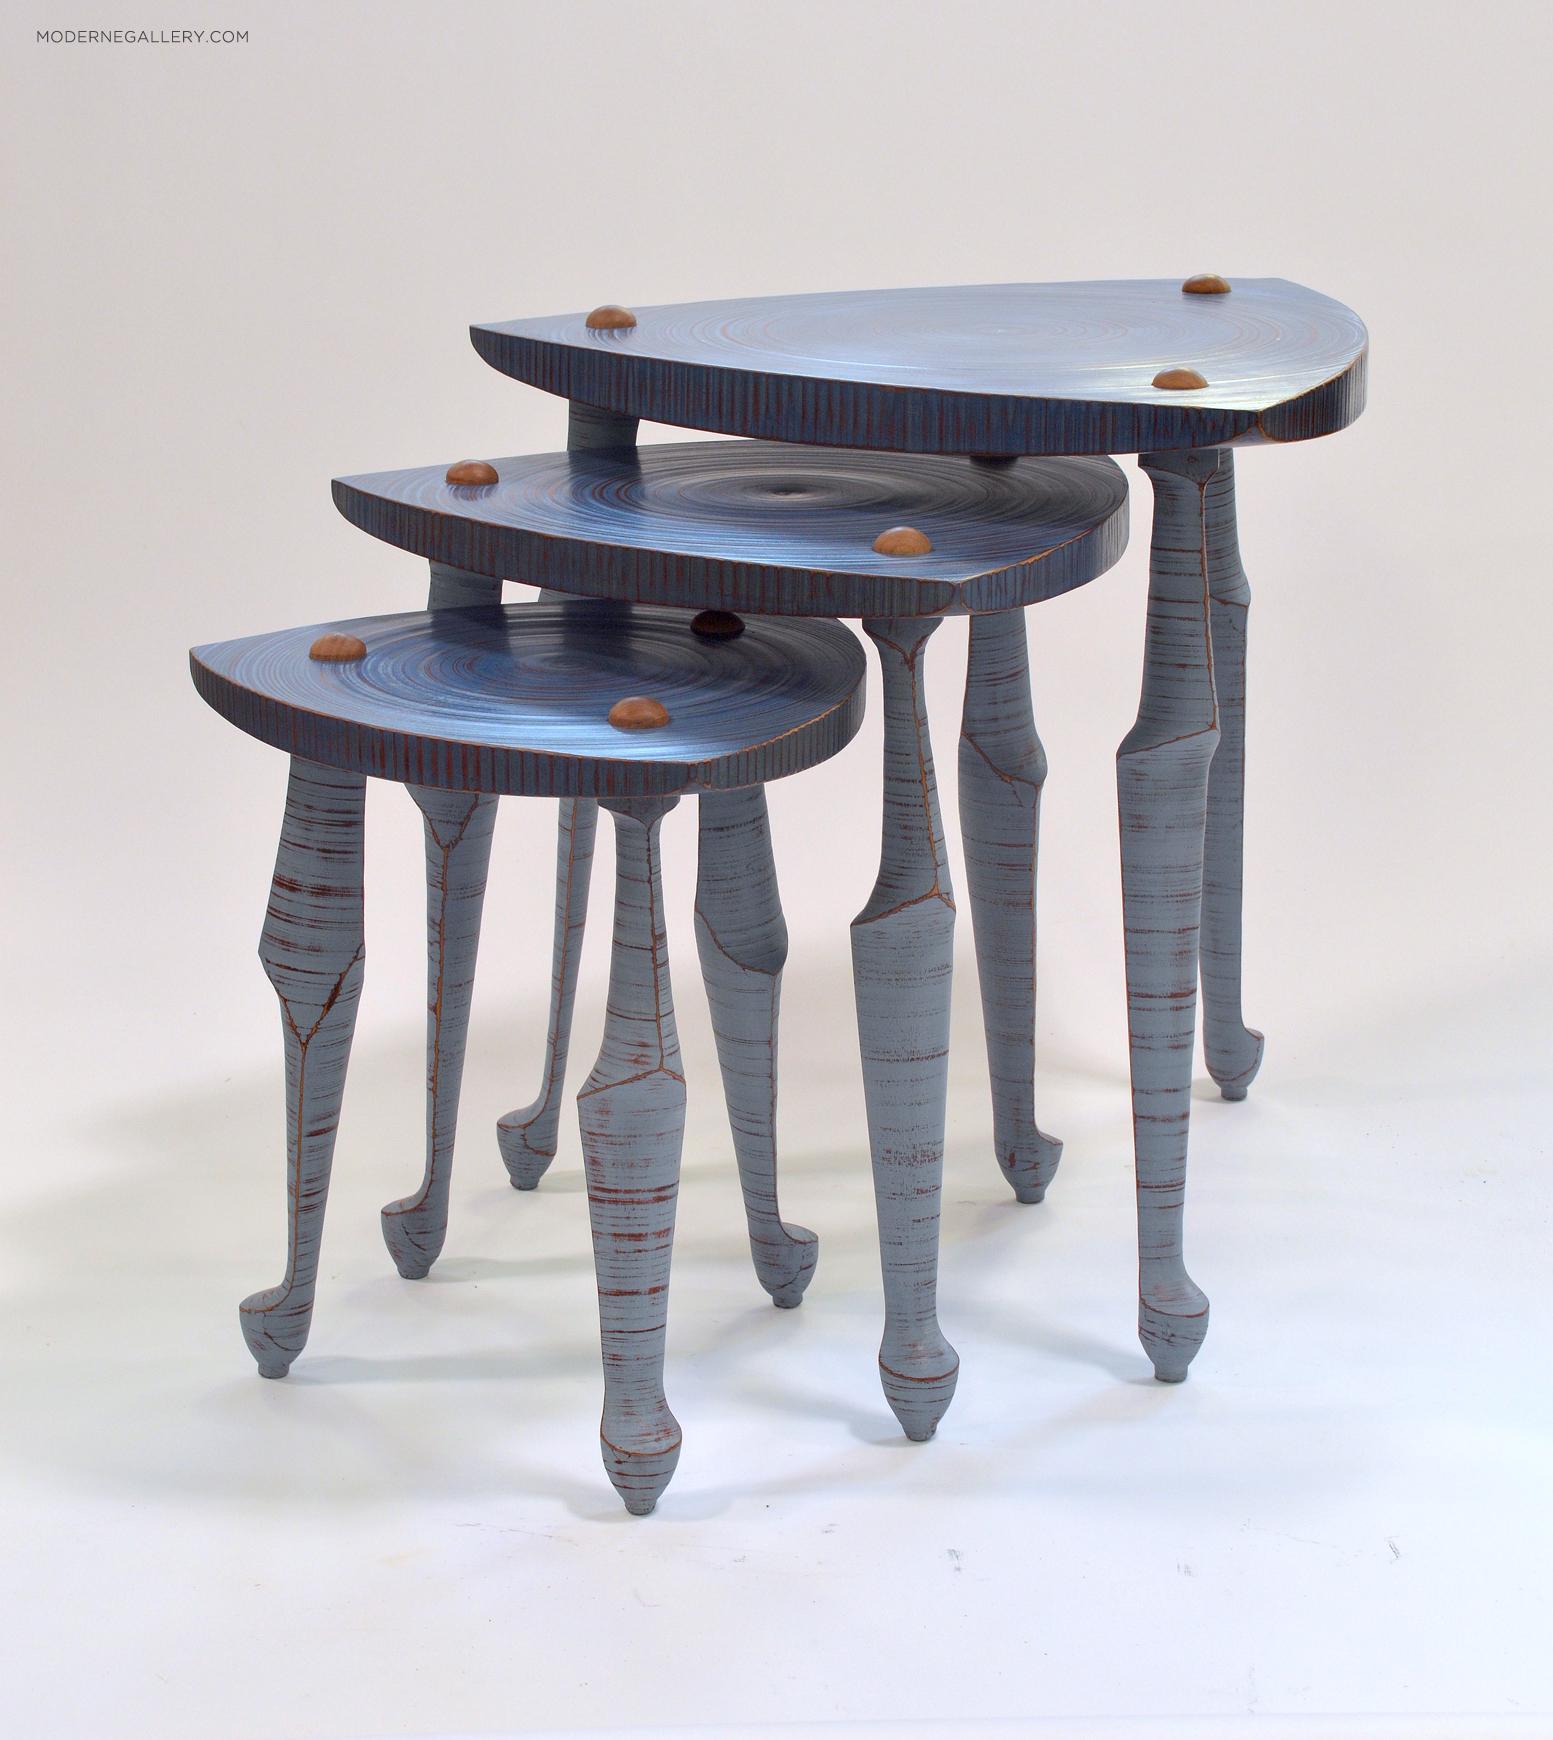 Best of Contemporary Art at Design Miami 2018 - Modern - Meta Nesting Tables - John Conver Lutz moderne gallery Best of Collectible Design at Design Miami/ 2018: Moderne Gallery Best of Contemporary Art at Design Miami 2018 Modern Meta Nesting Tables John Cover Lutz